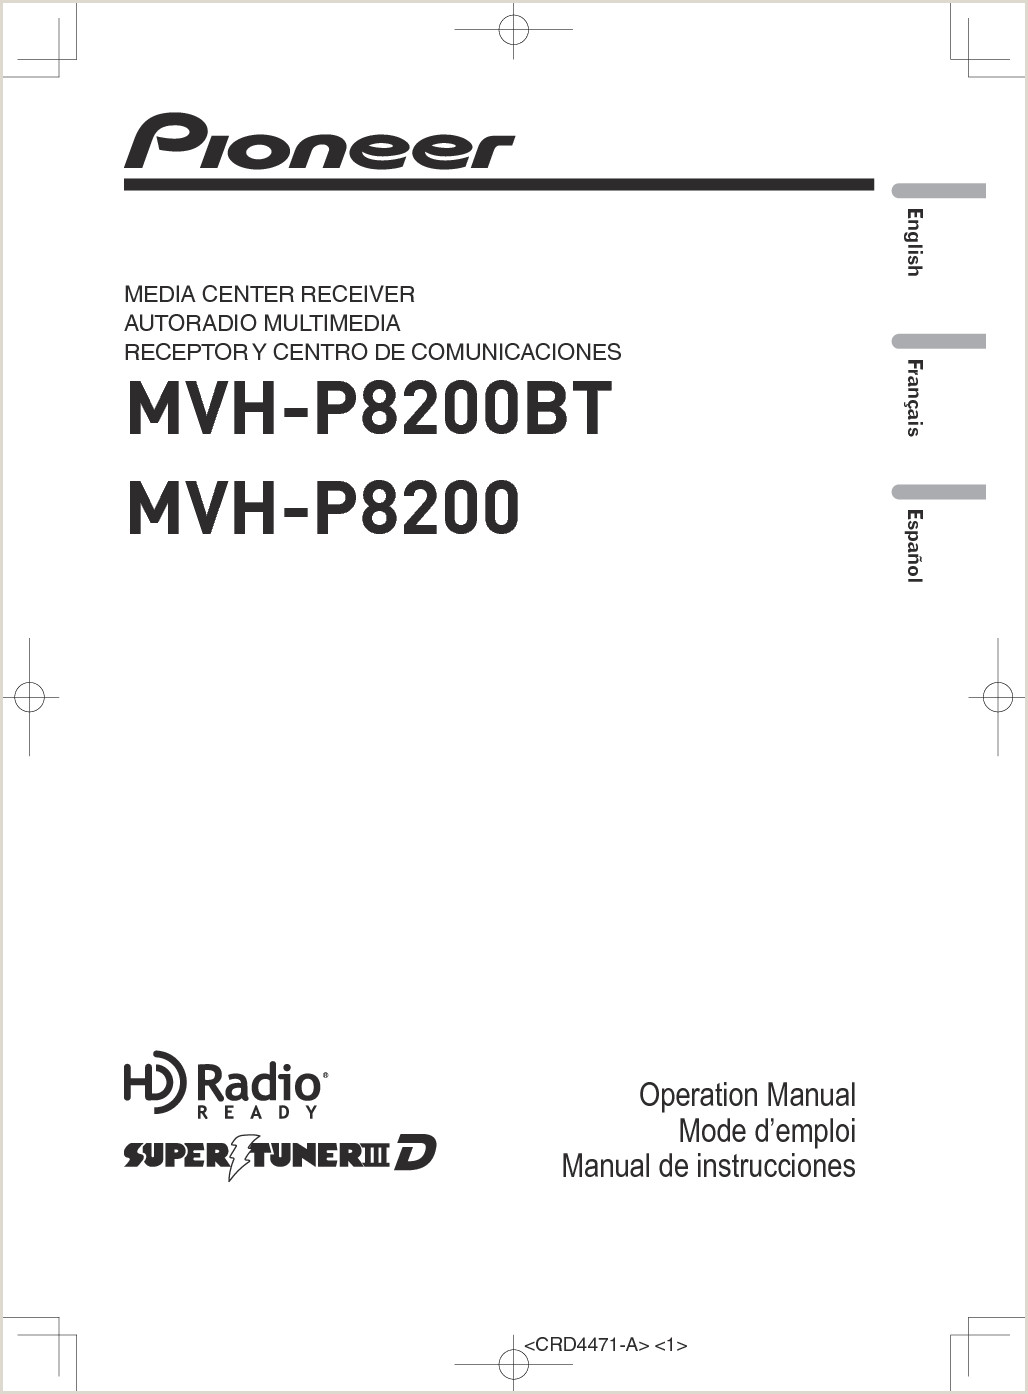 K029 Media Center Receiver User Manual Pioneer